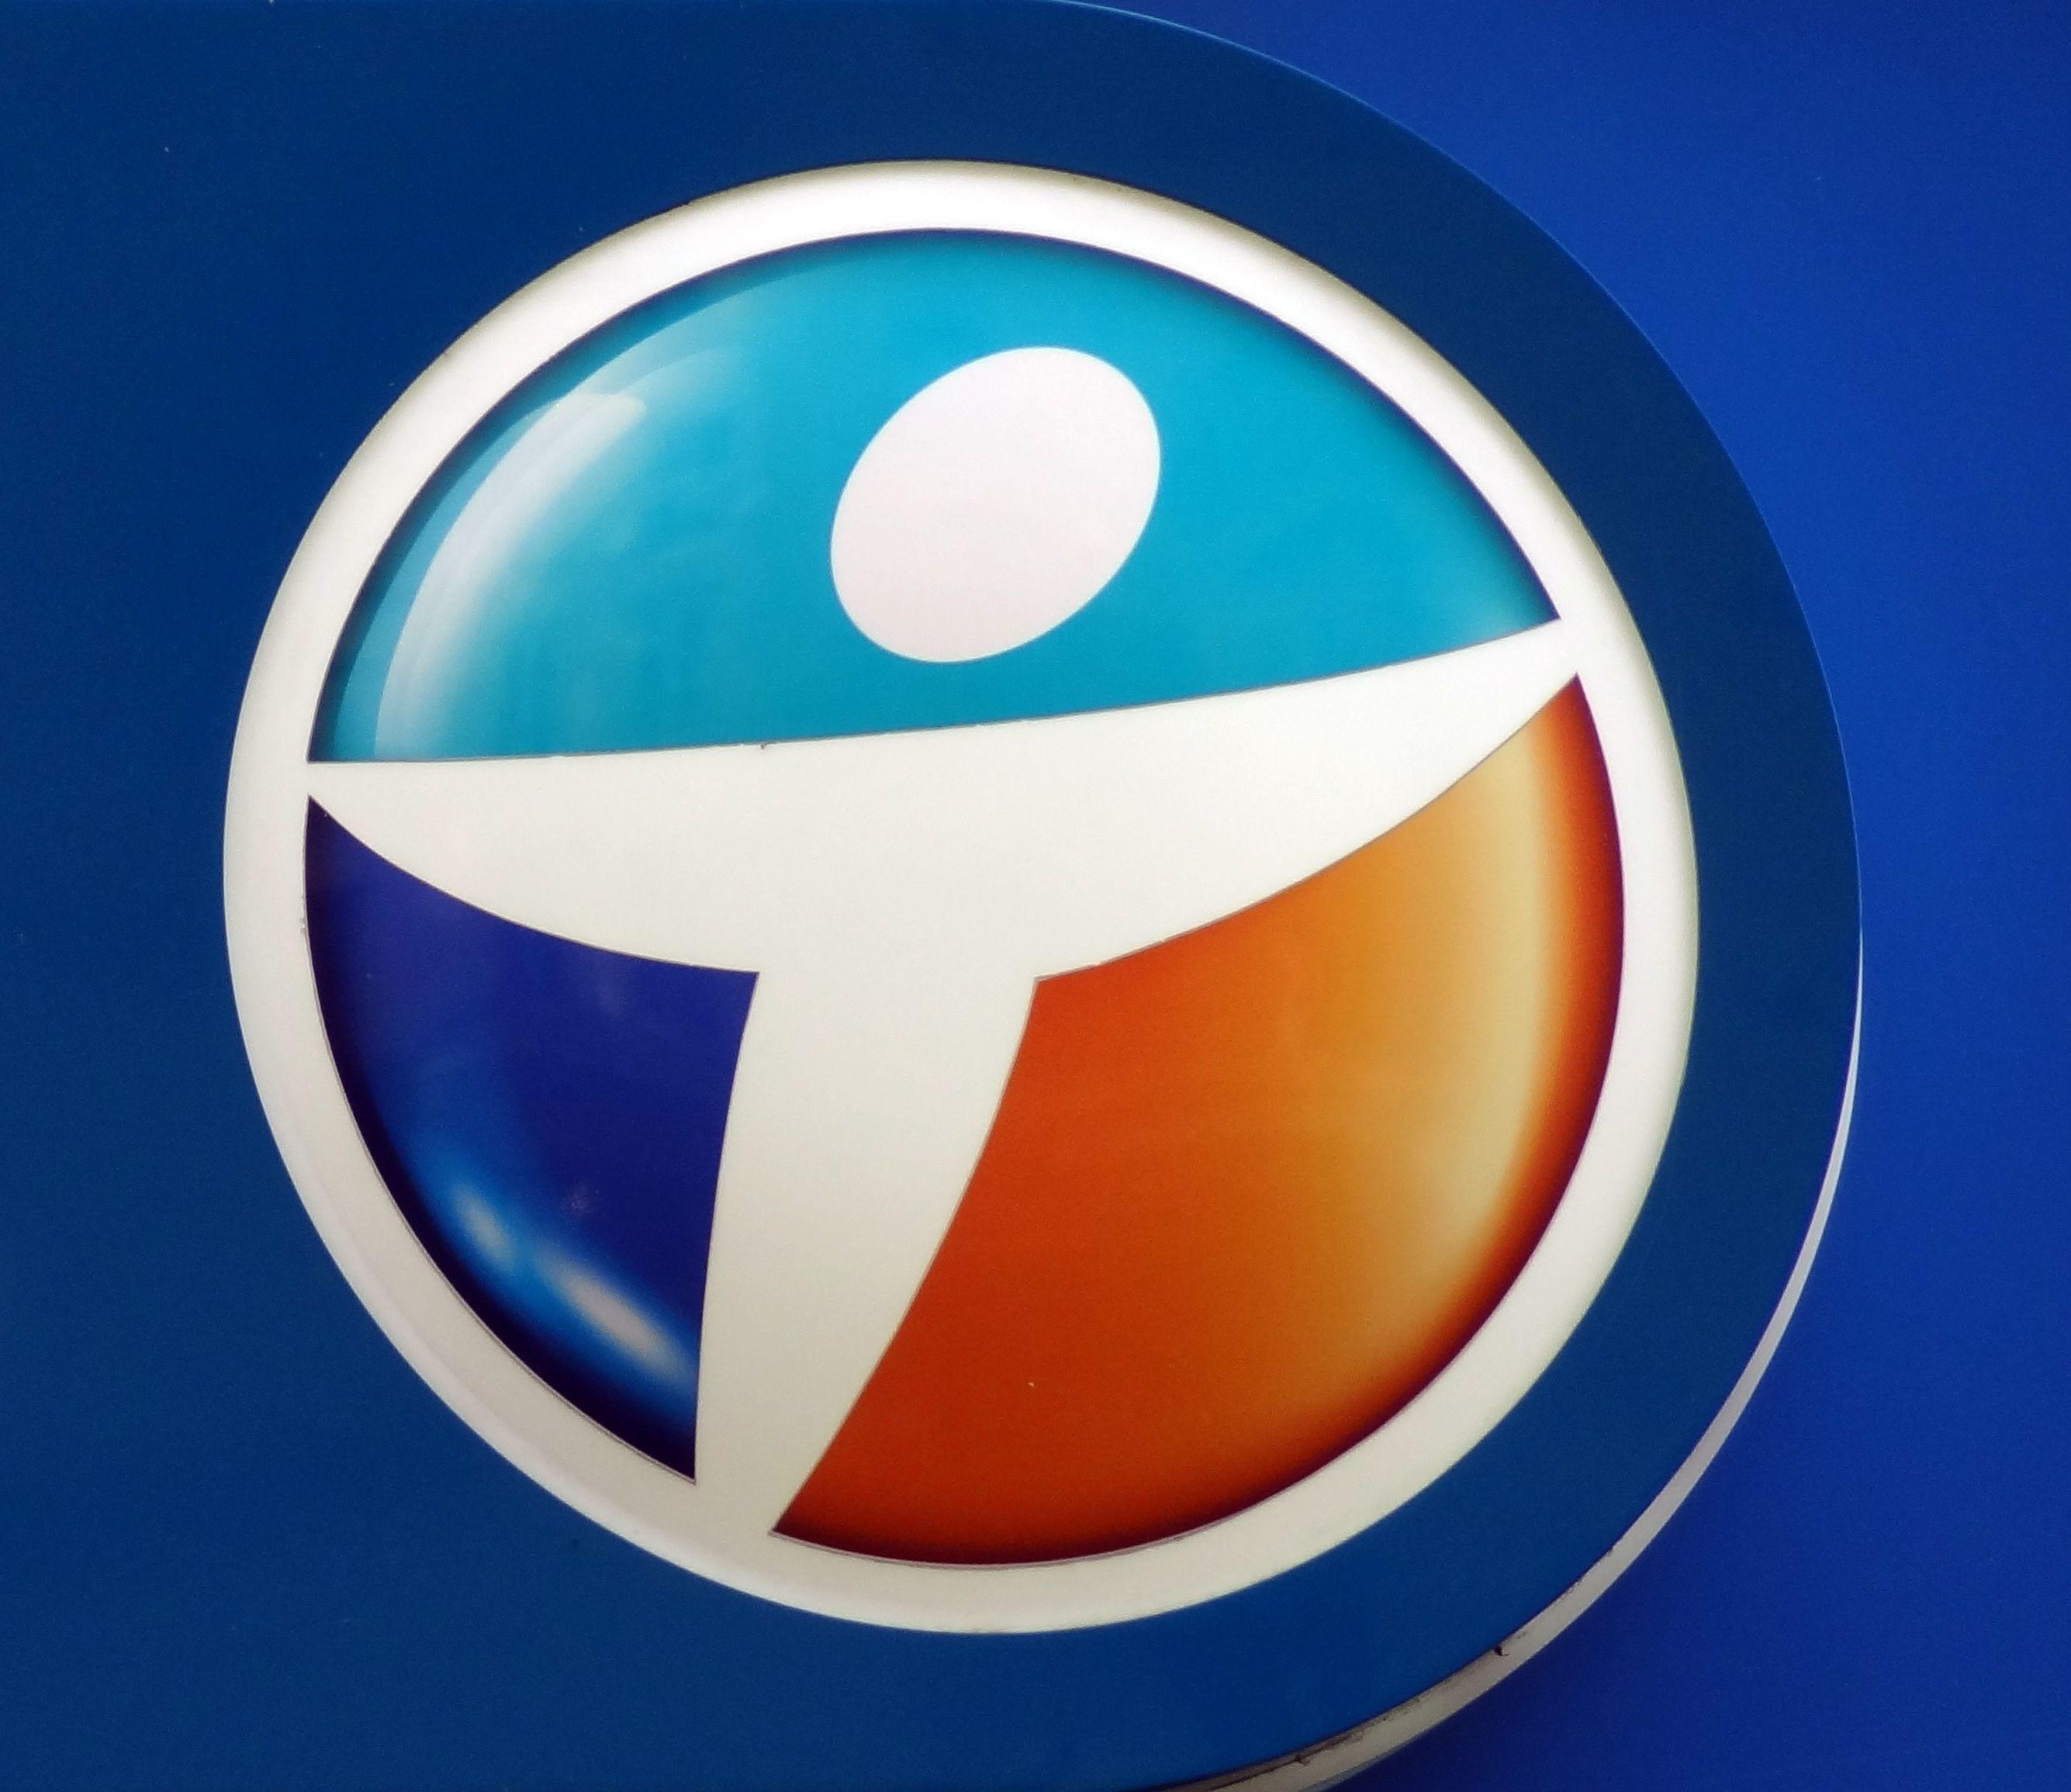 Le logo de Bouygues Telecom.